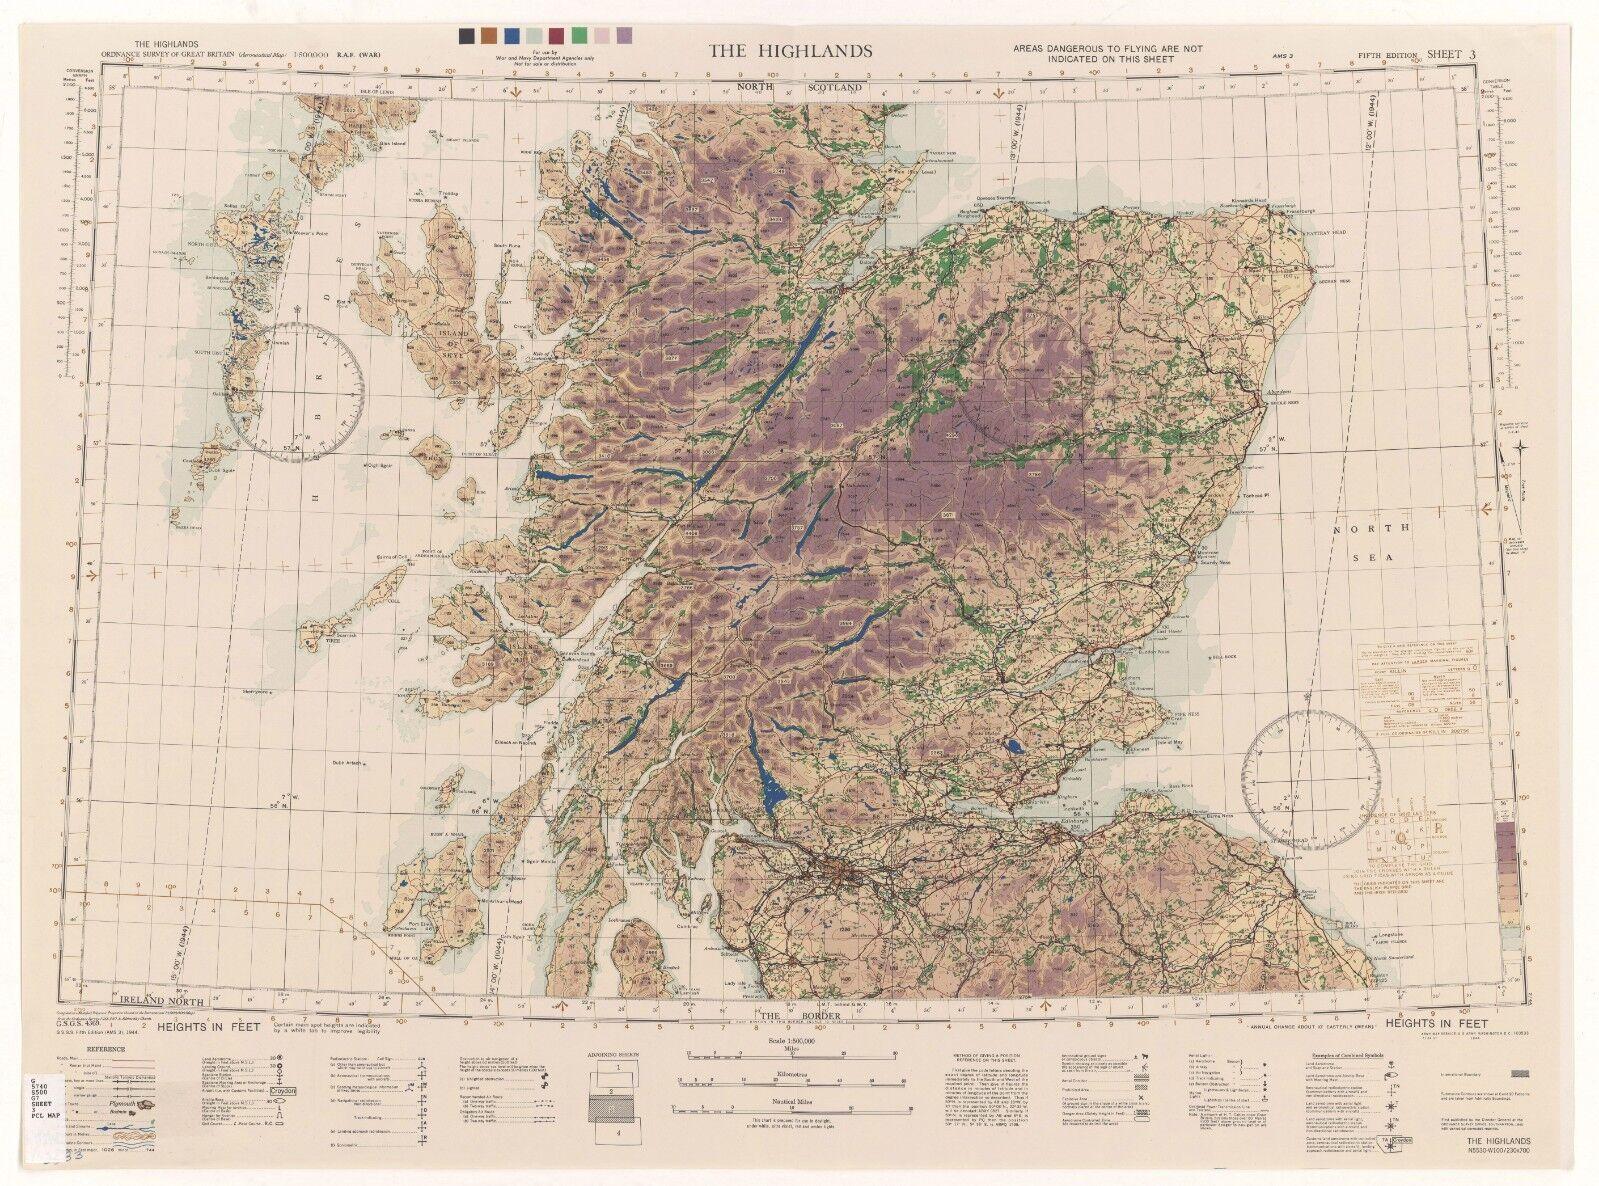 WW2 RAF MAP OF THE HIGHLANDS PRINT